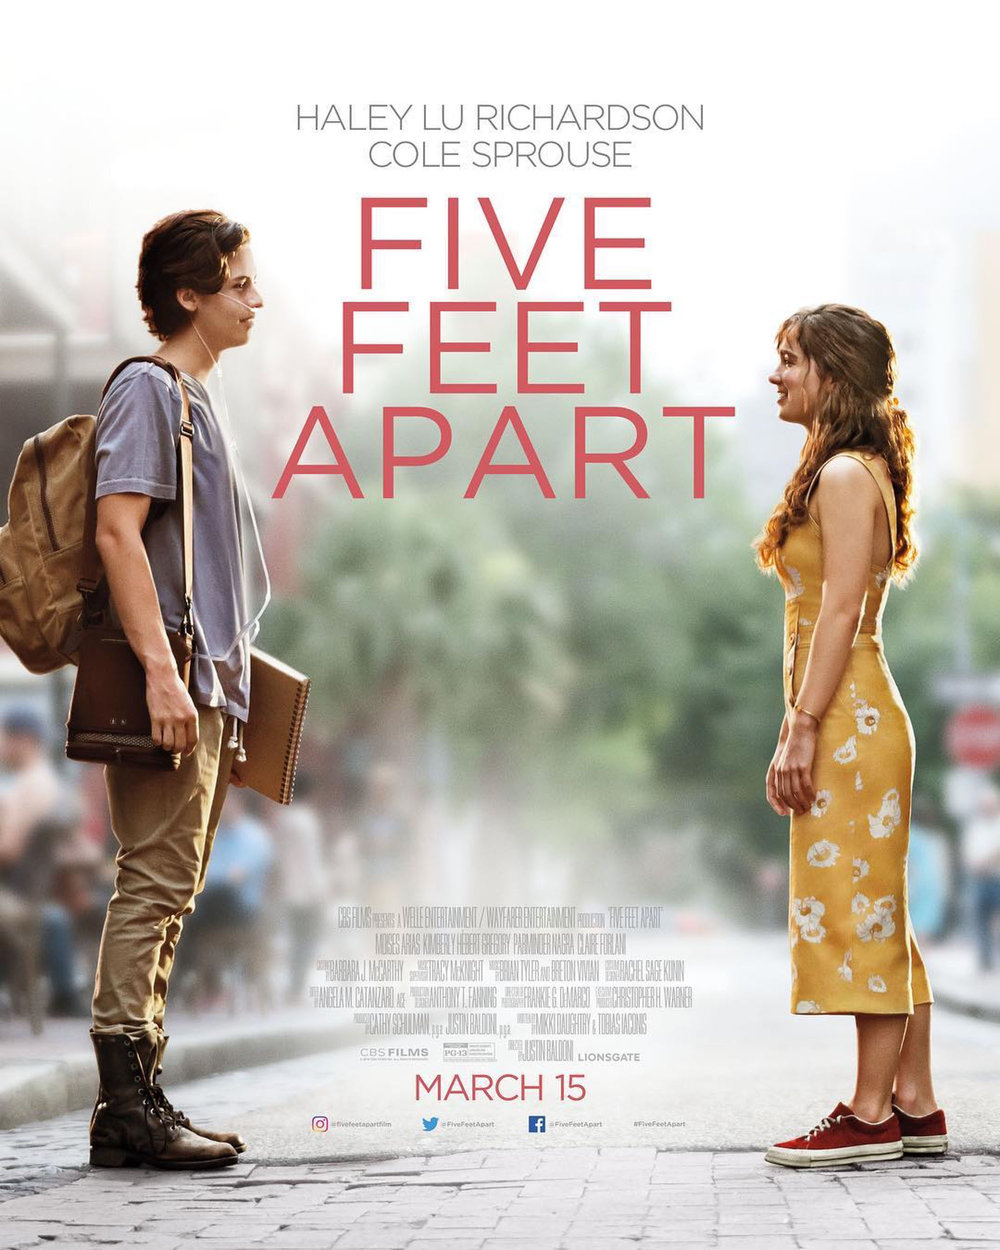 Cole Sprouse and Haley Lu Richardson. Alfonso Bresciani/CBS Films/Lionsgate